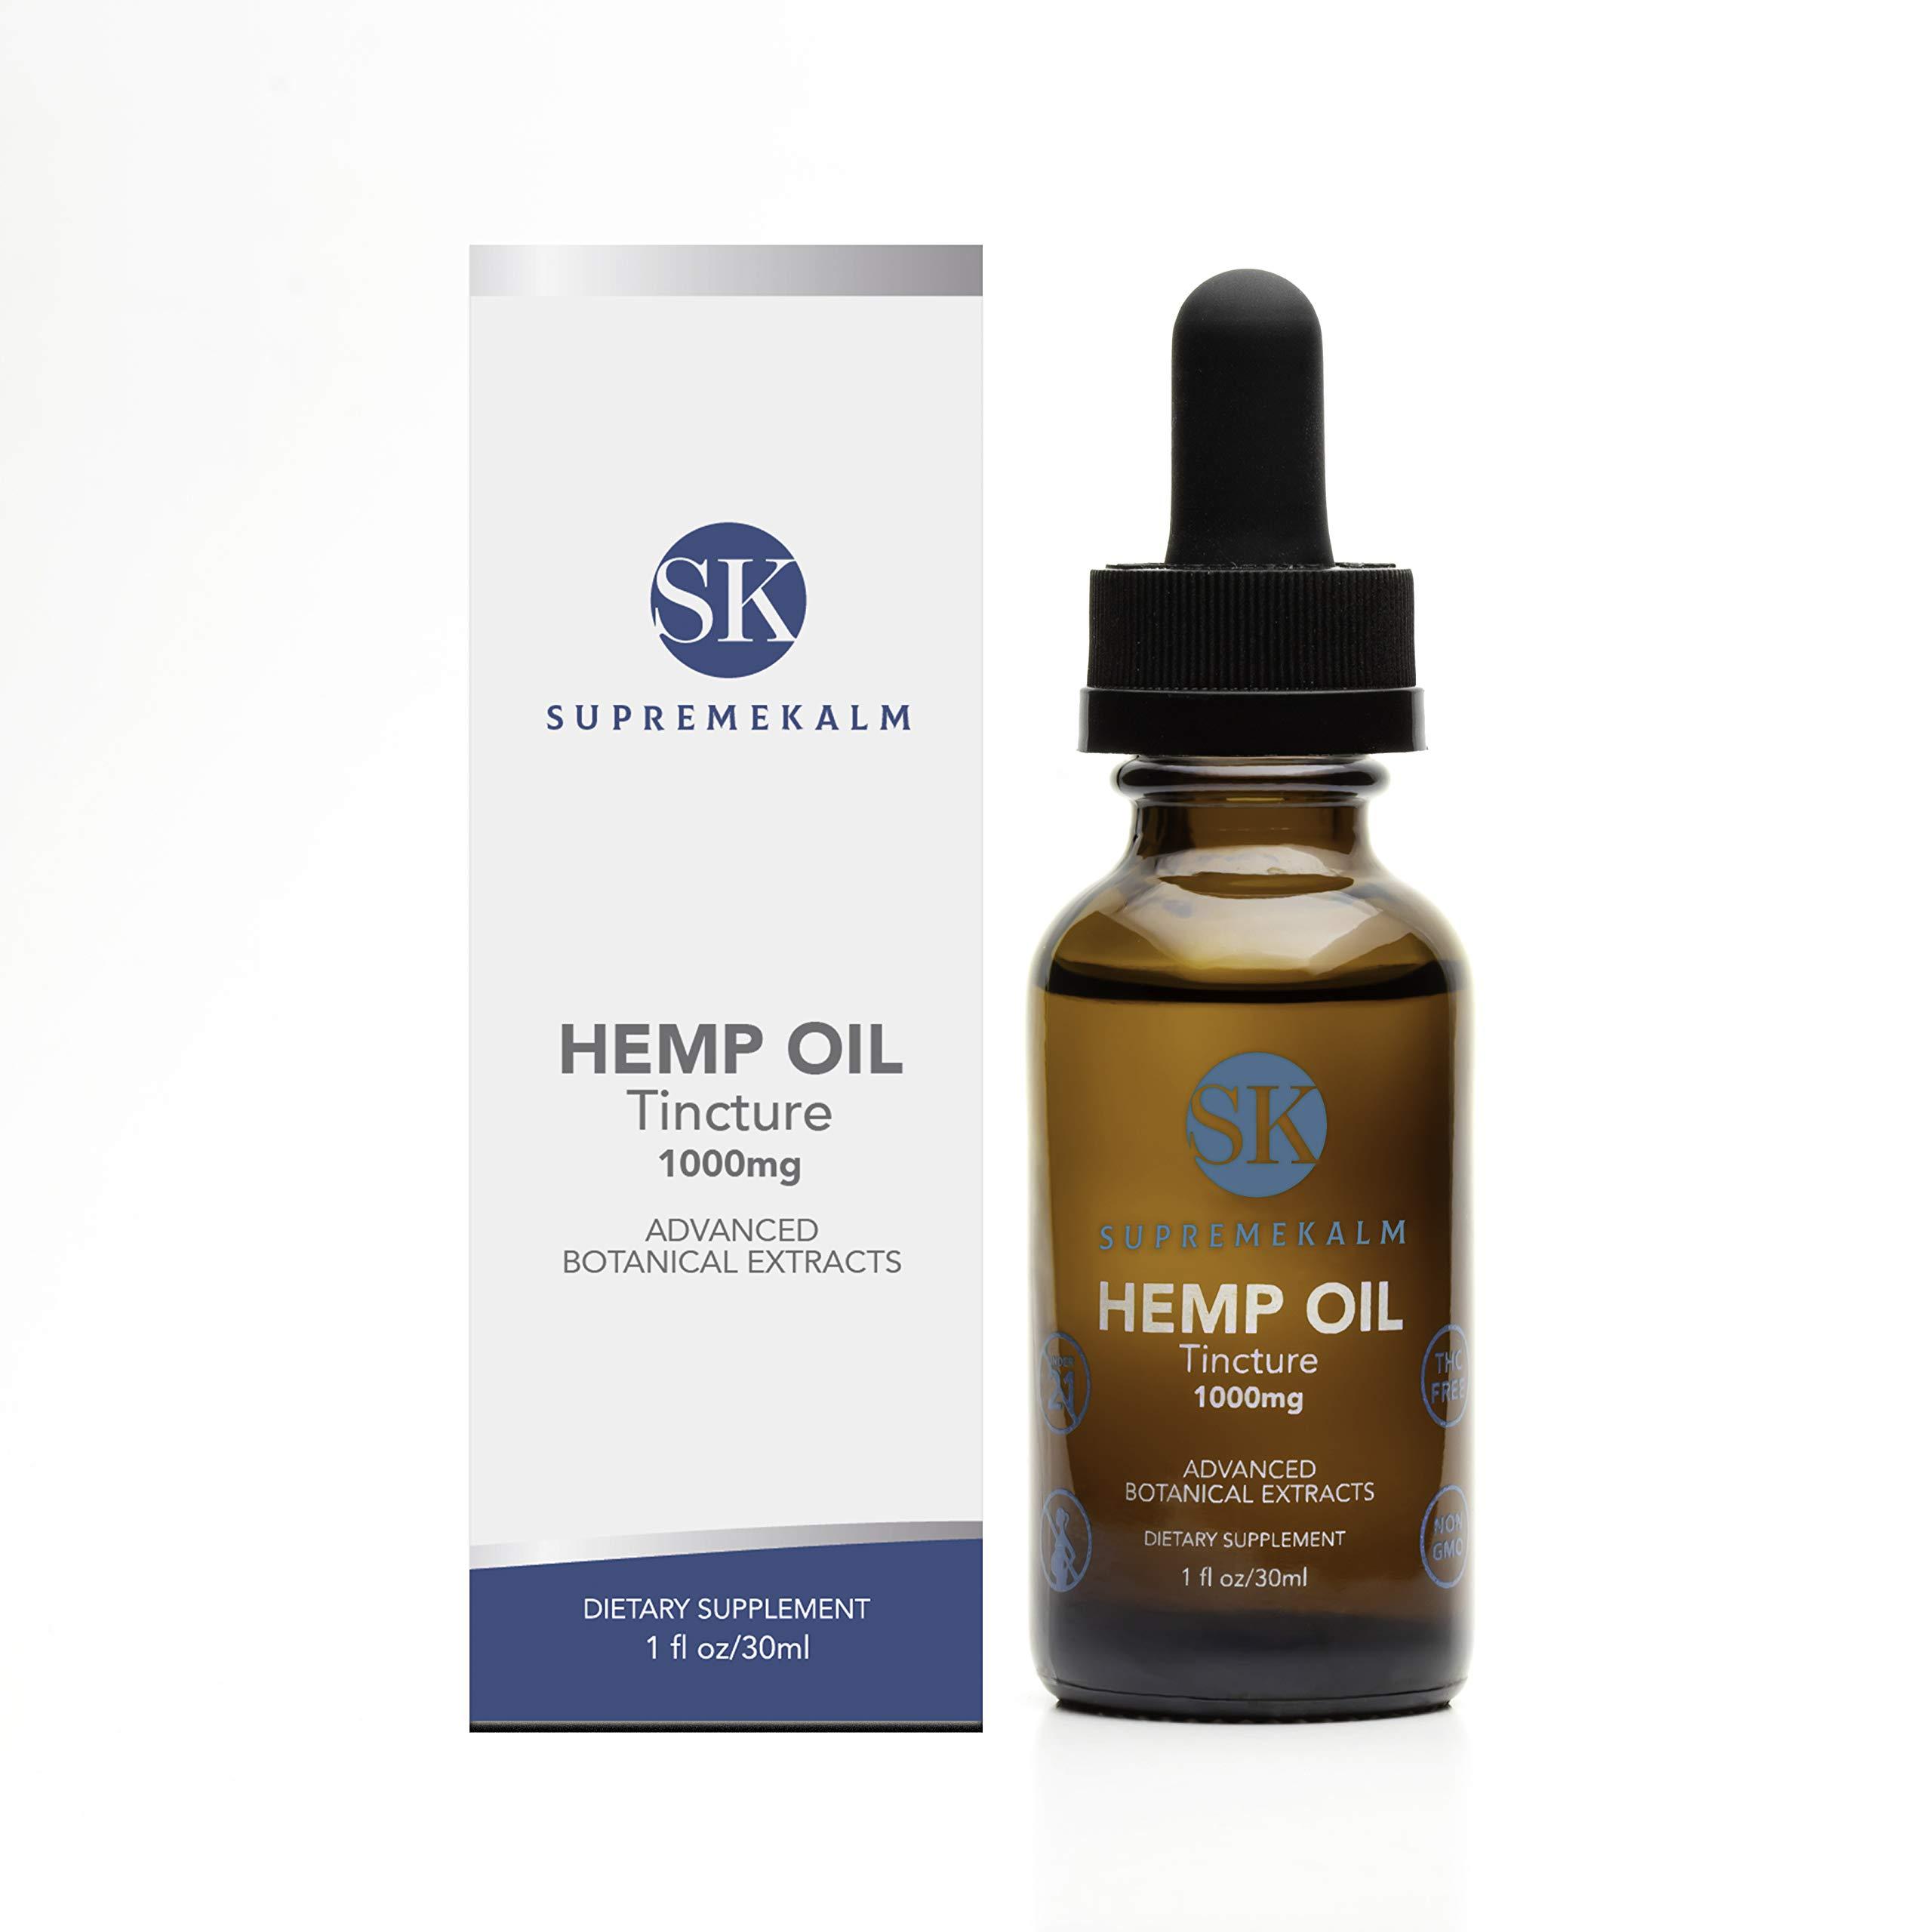 SupremeKalm Hemp Oil Tincture Bottle 1000mg - 99.6% Hemp Isolate - Advanced Botanical Extracts - 100% THC & CBD Free - 1 fl oz (30 ml)